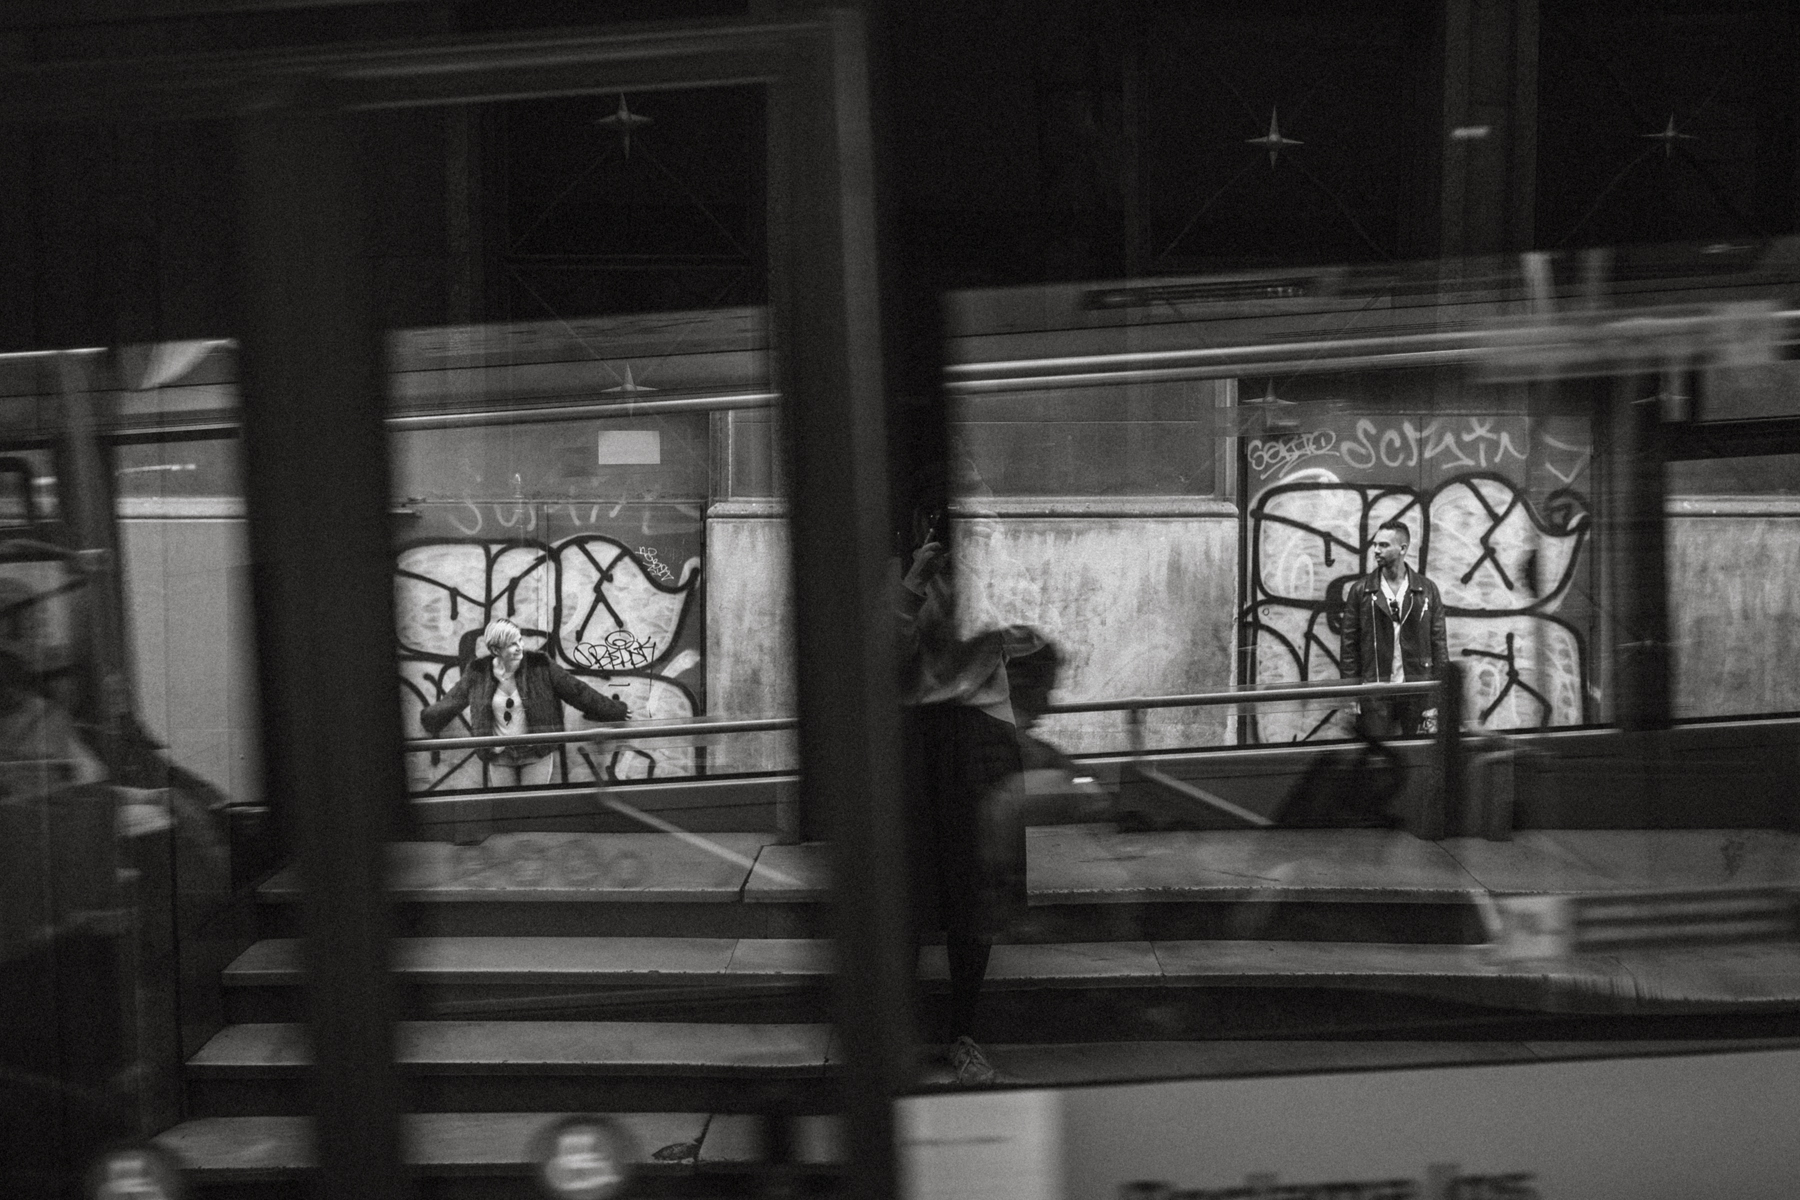 raissa simon fotografie urban coupleshooting barcelona 034 - Wietske + Stefanos